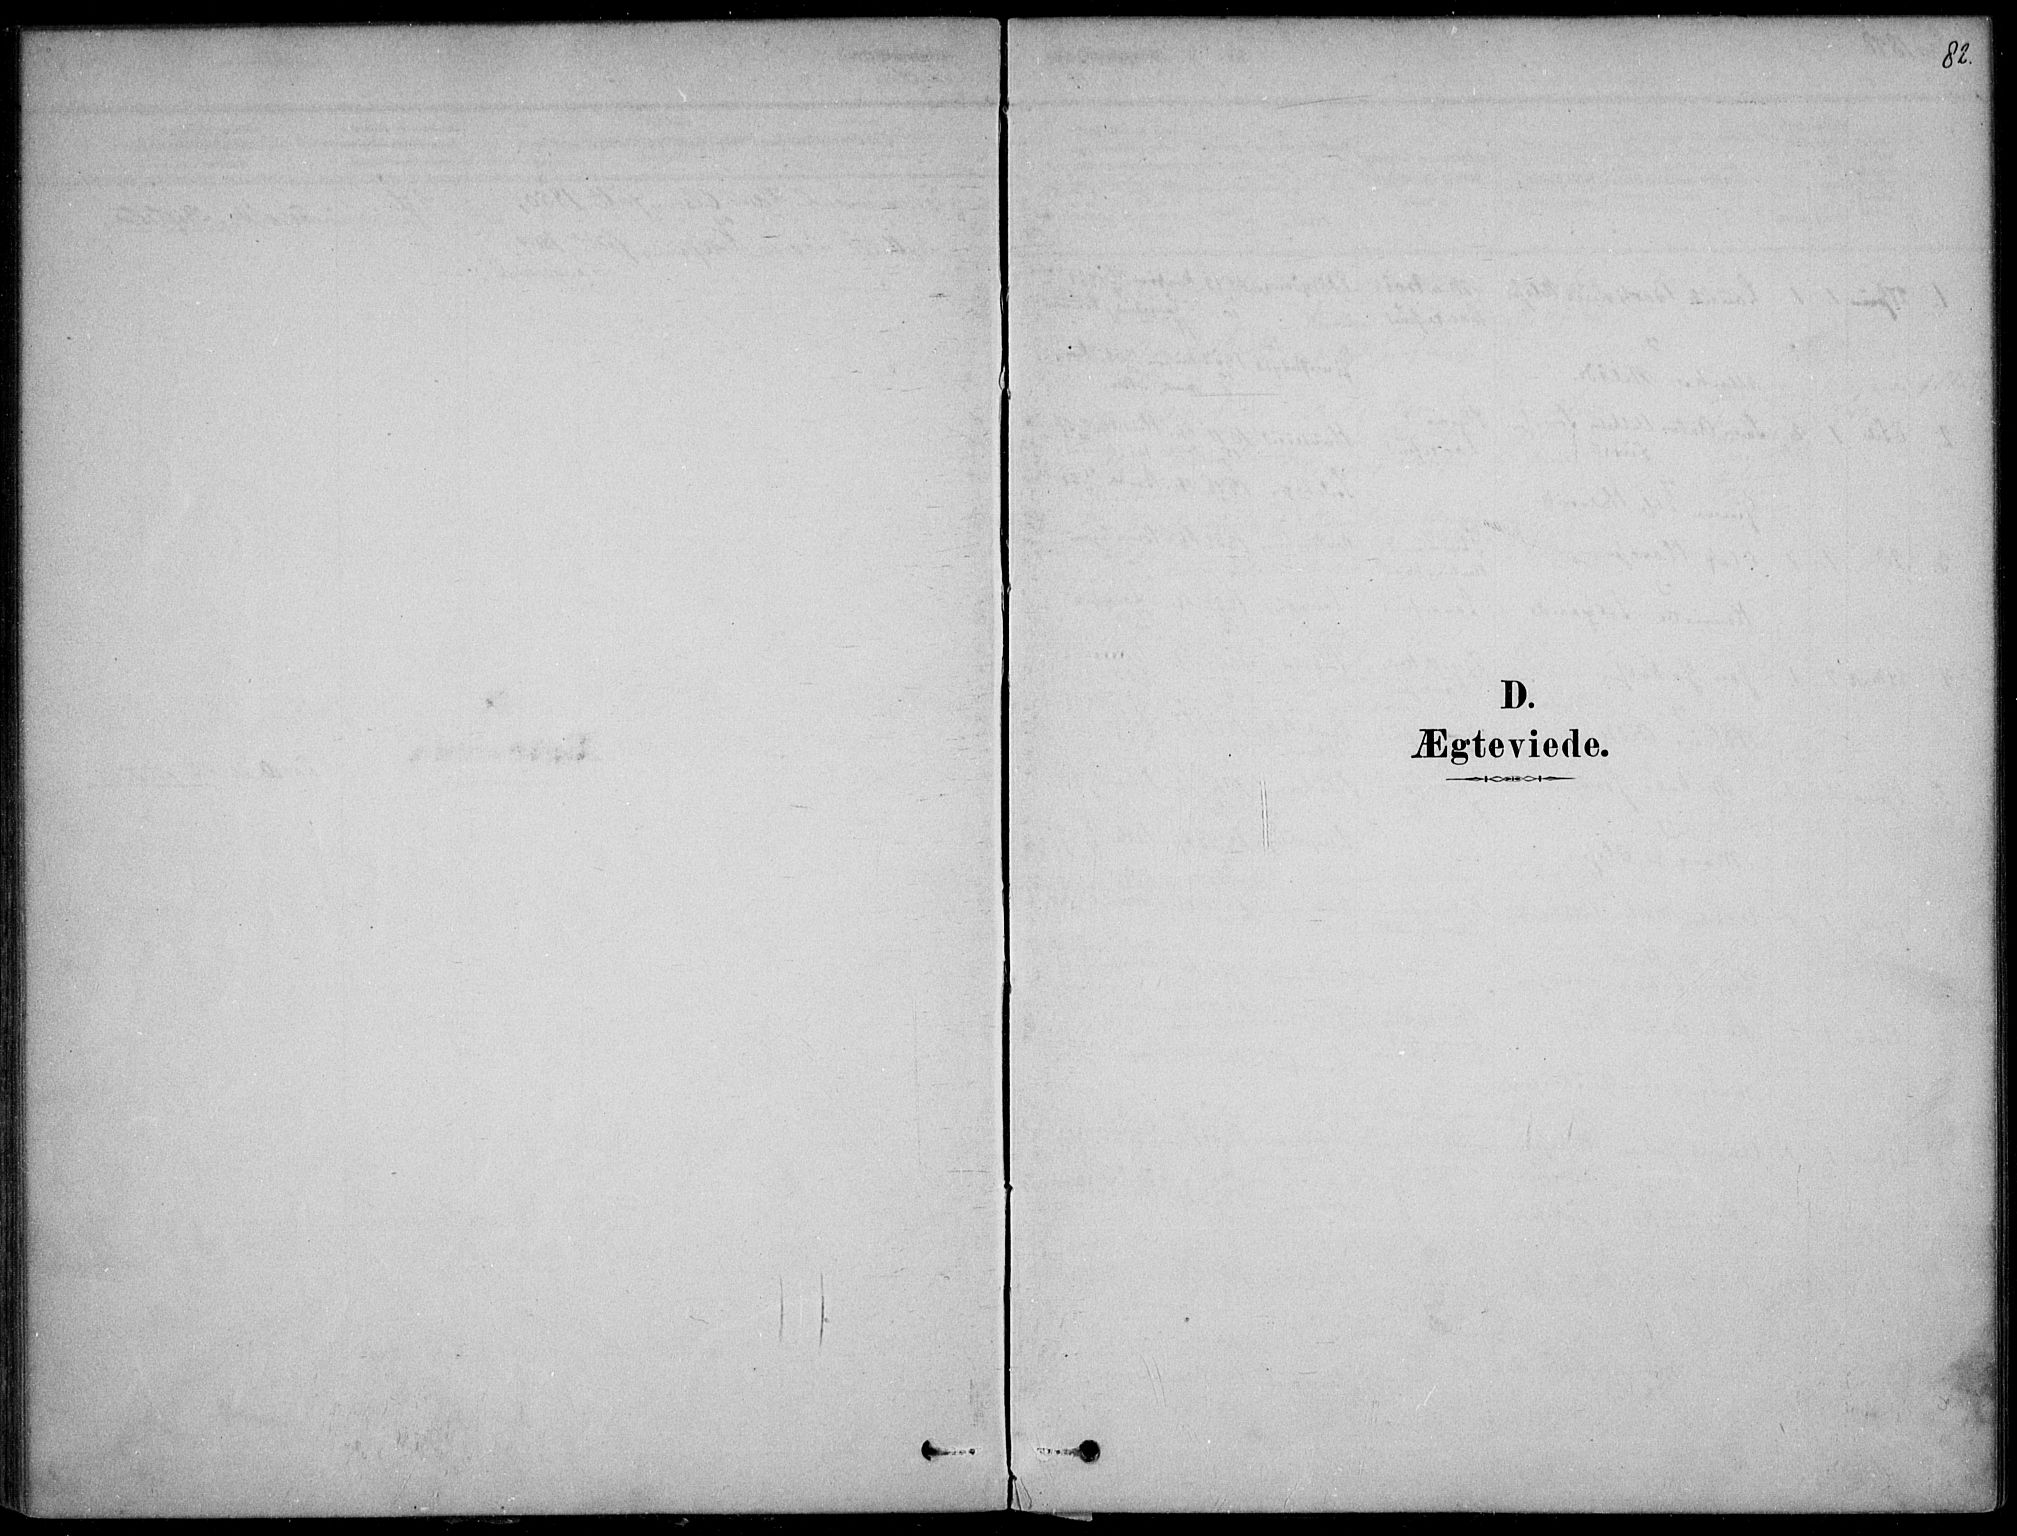 SAKO, Langesund kirkebøker, F/Fa/L0002: Ministerialbok nr. 2, 1878-1892, s. 82